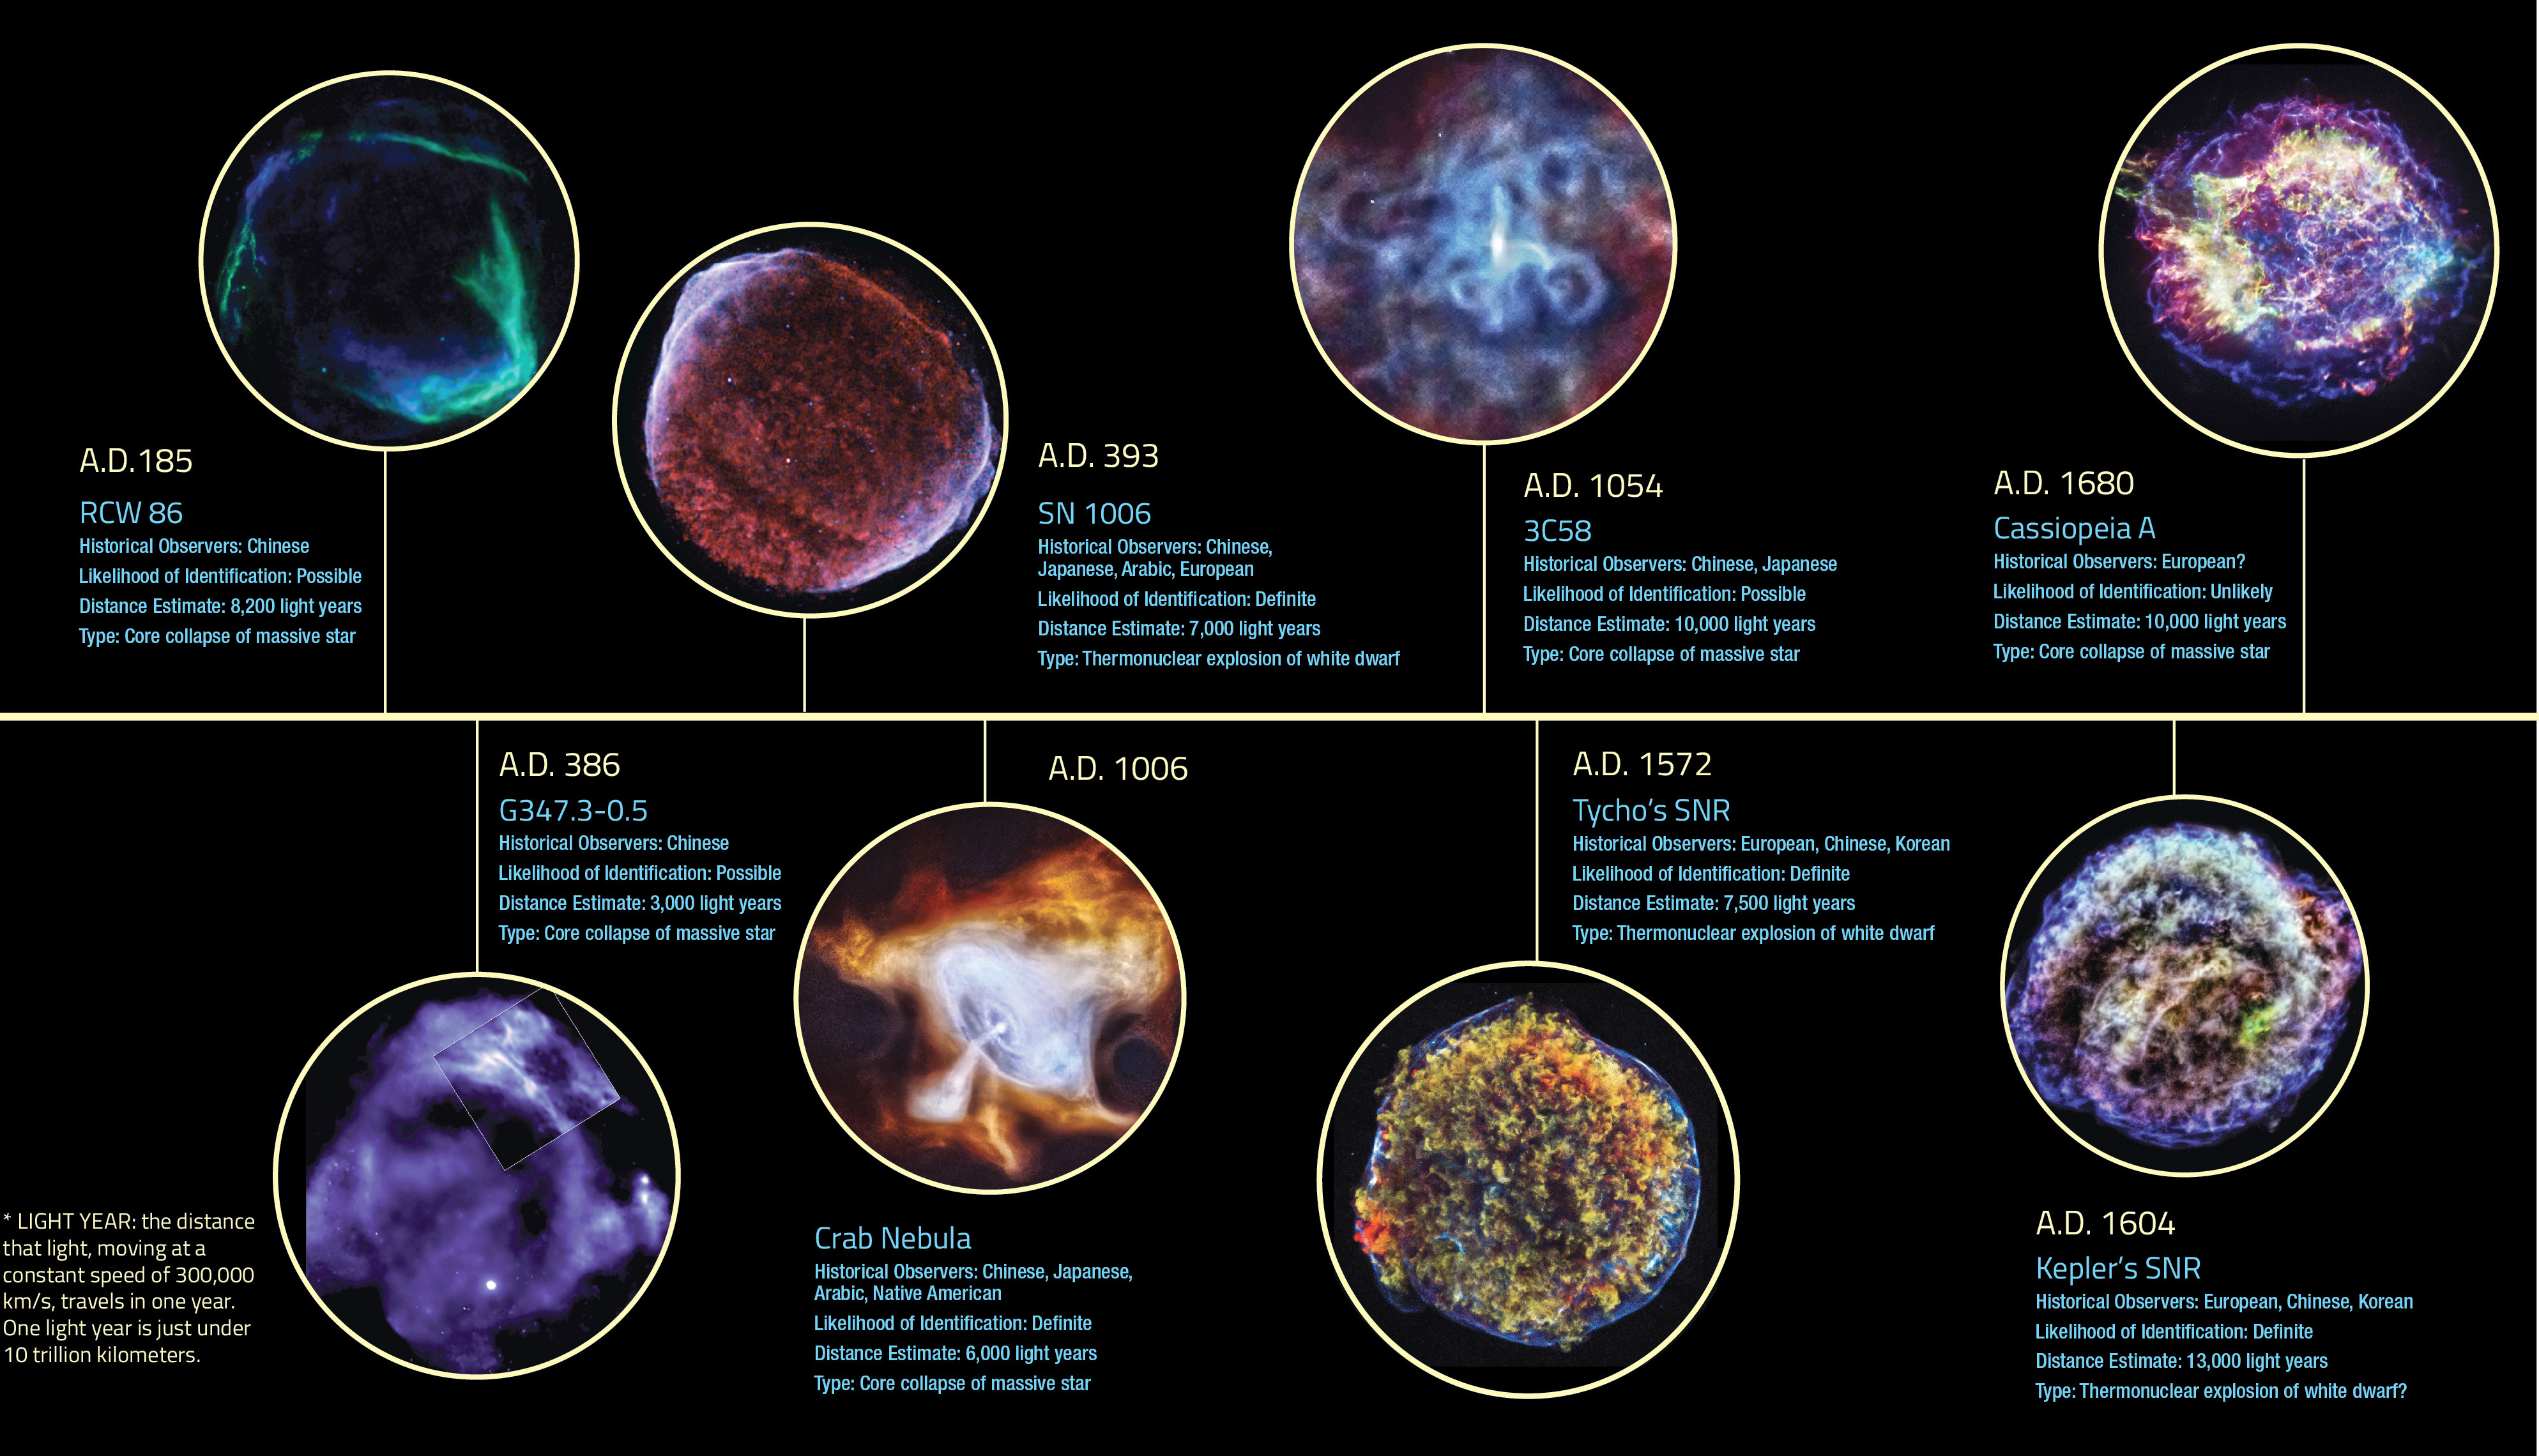 History of supernova observation